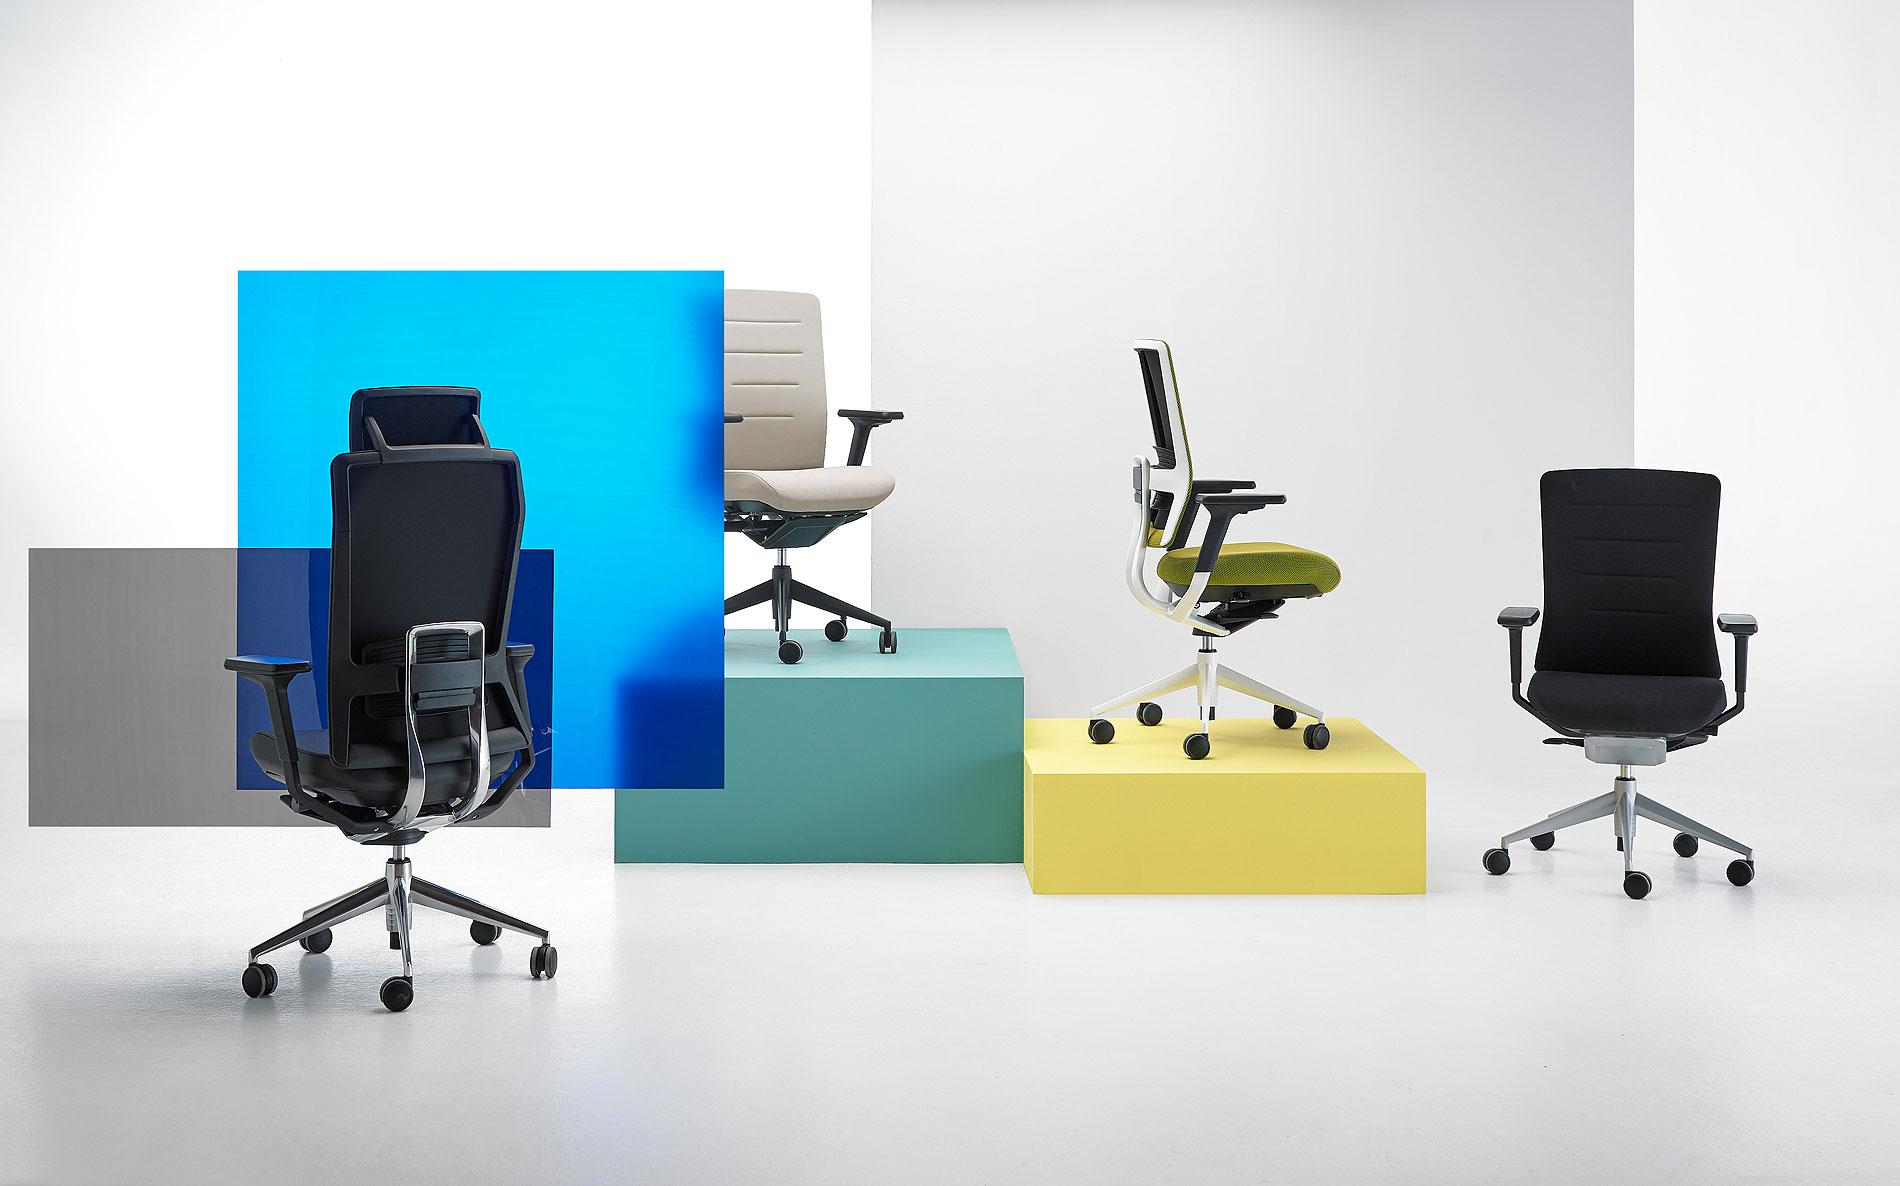 silla-tnk-flex-alegre-design-actiu-cool-working (1)